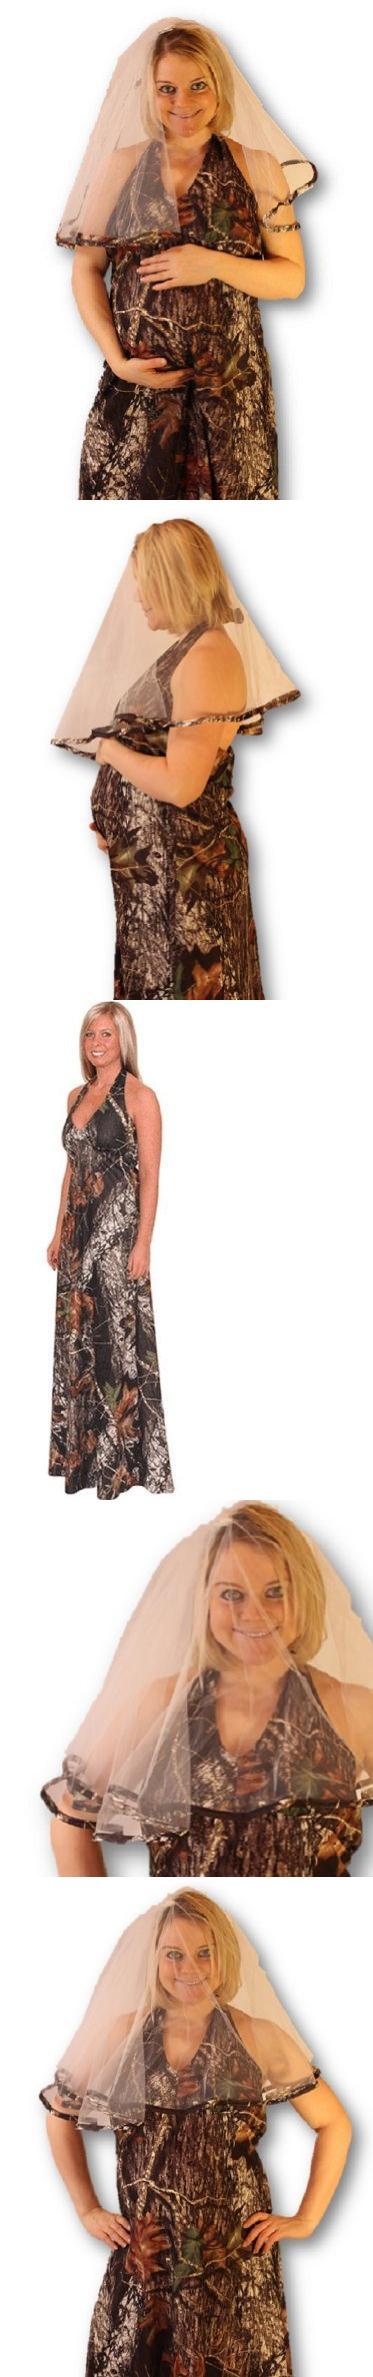 Maternityfriendly mossy oak camo wedding dress u veil package xsx